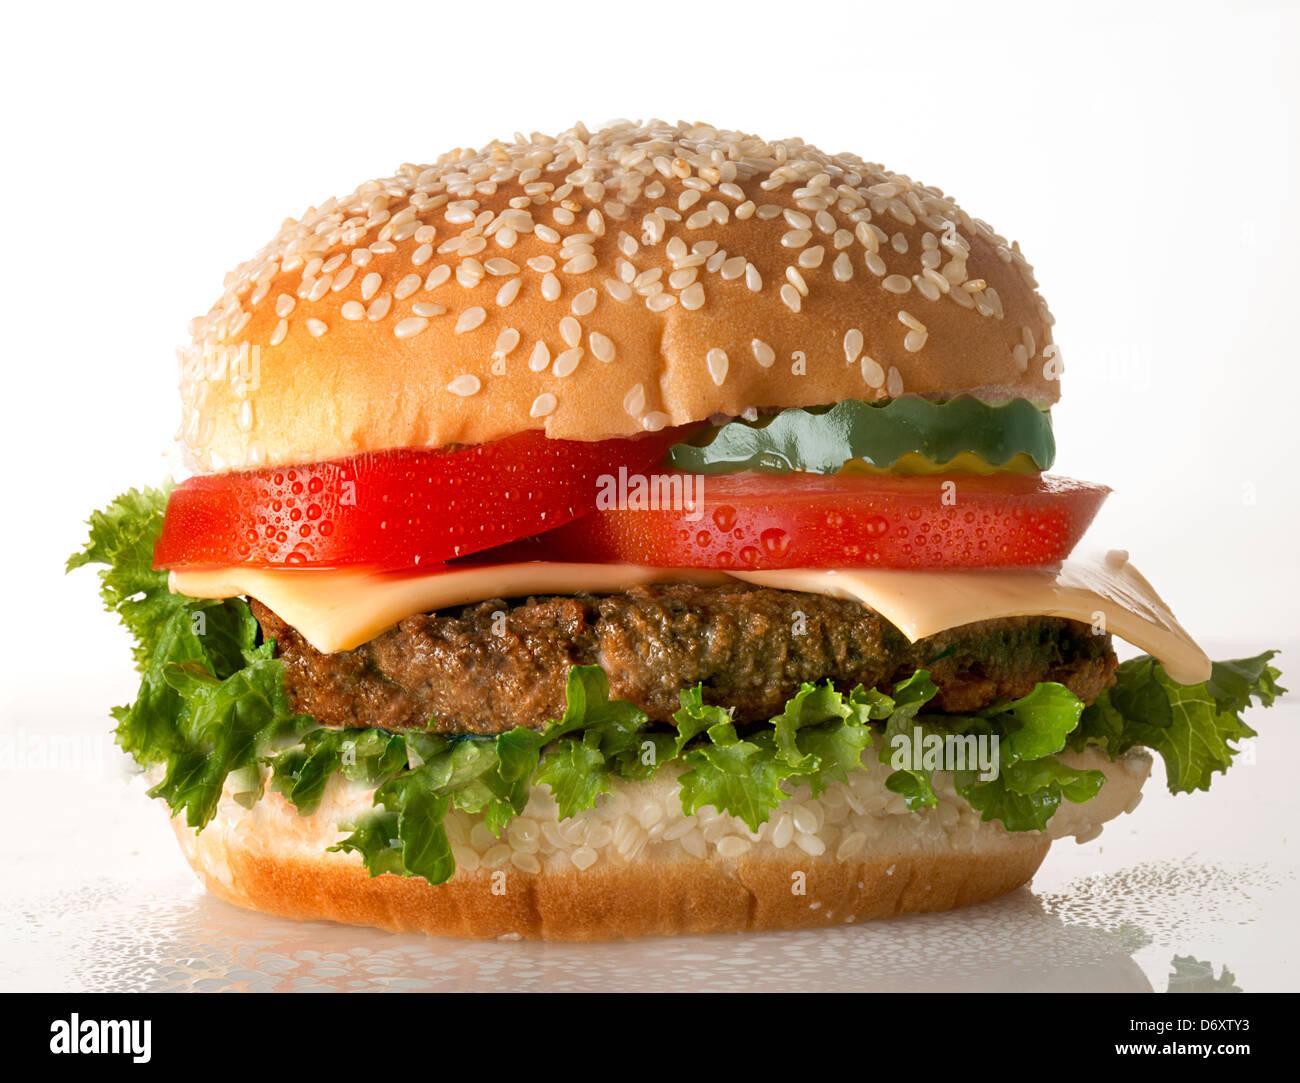 Hamburguesa con tomate Imagen De Stock